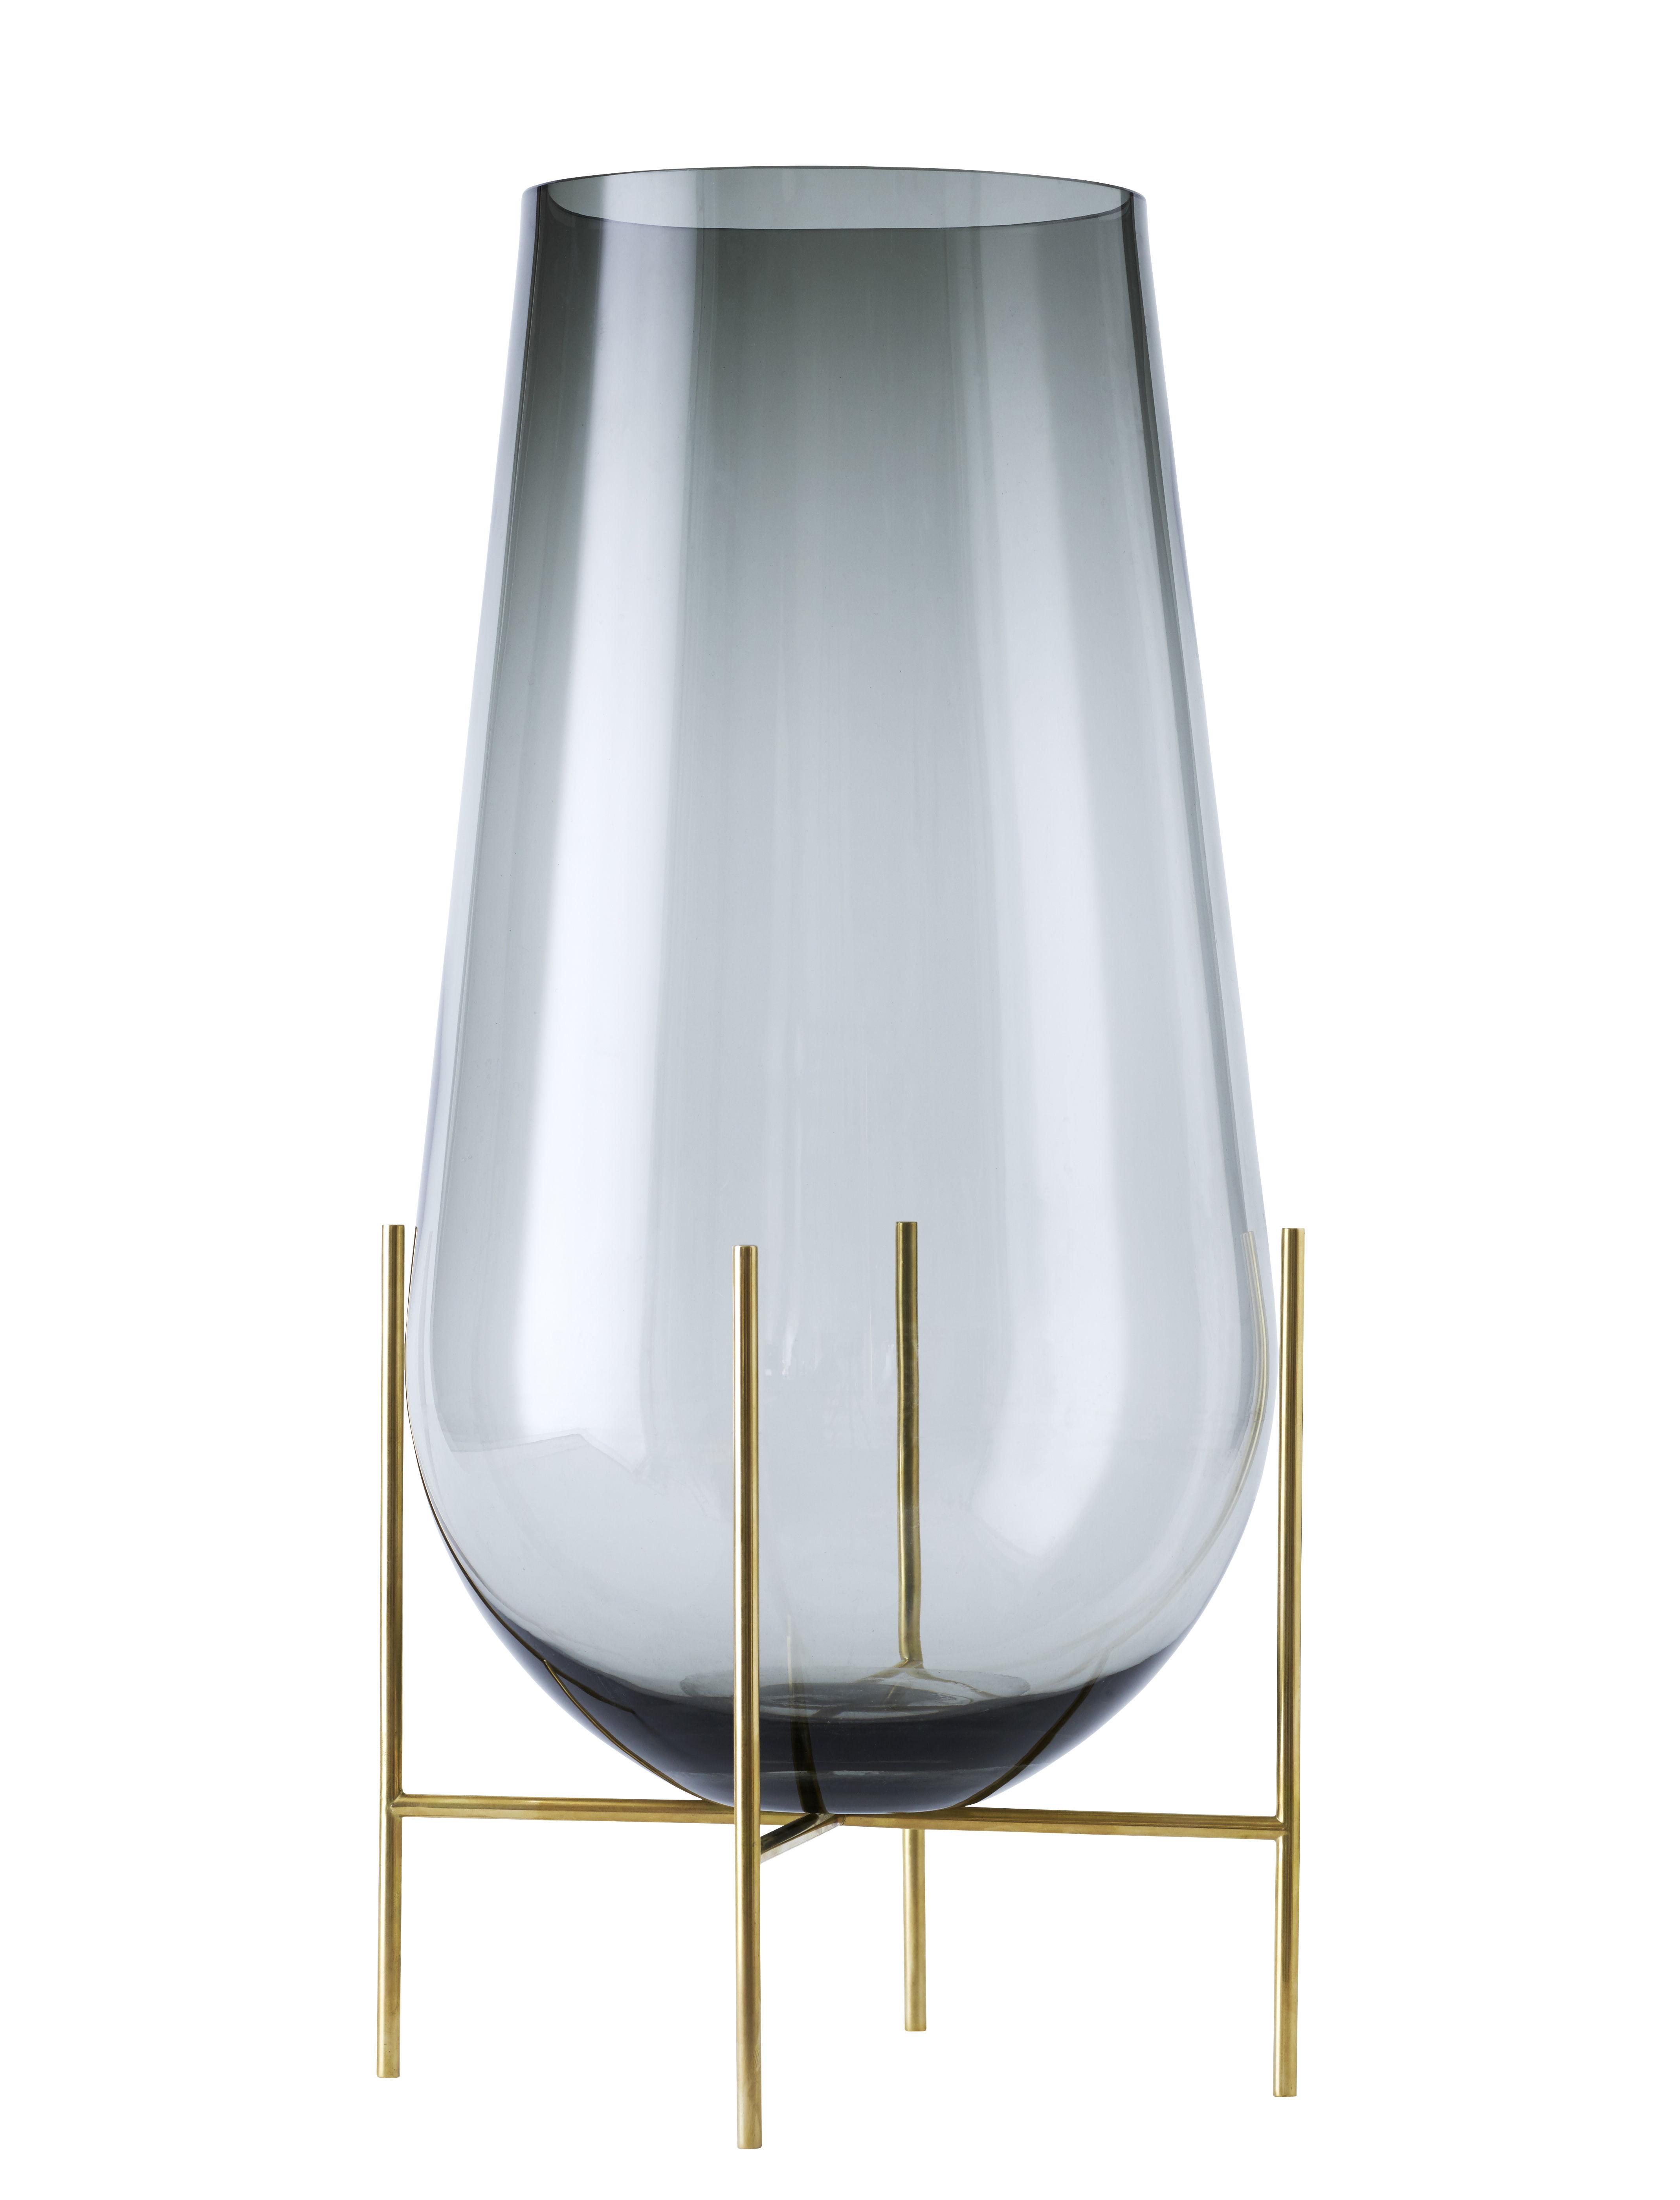 Decoration - Vases - Echasse Large Vase - H 60 cm / Glass & brass by Menu - Smoke / Brass - Glass, Solid brass